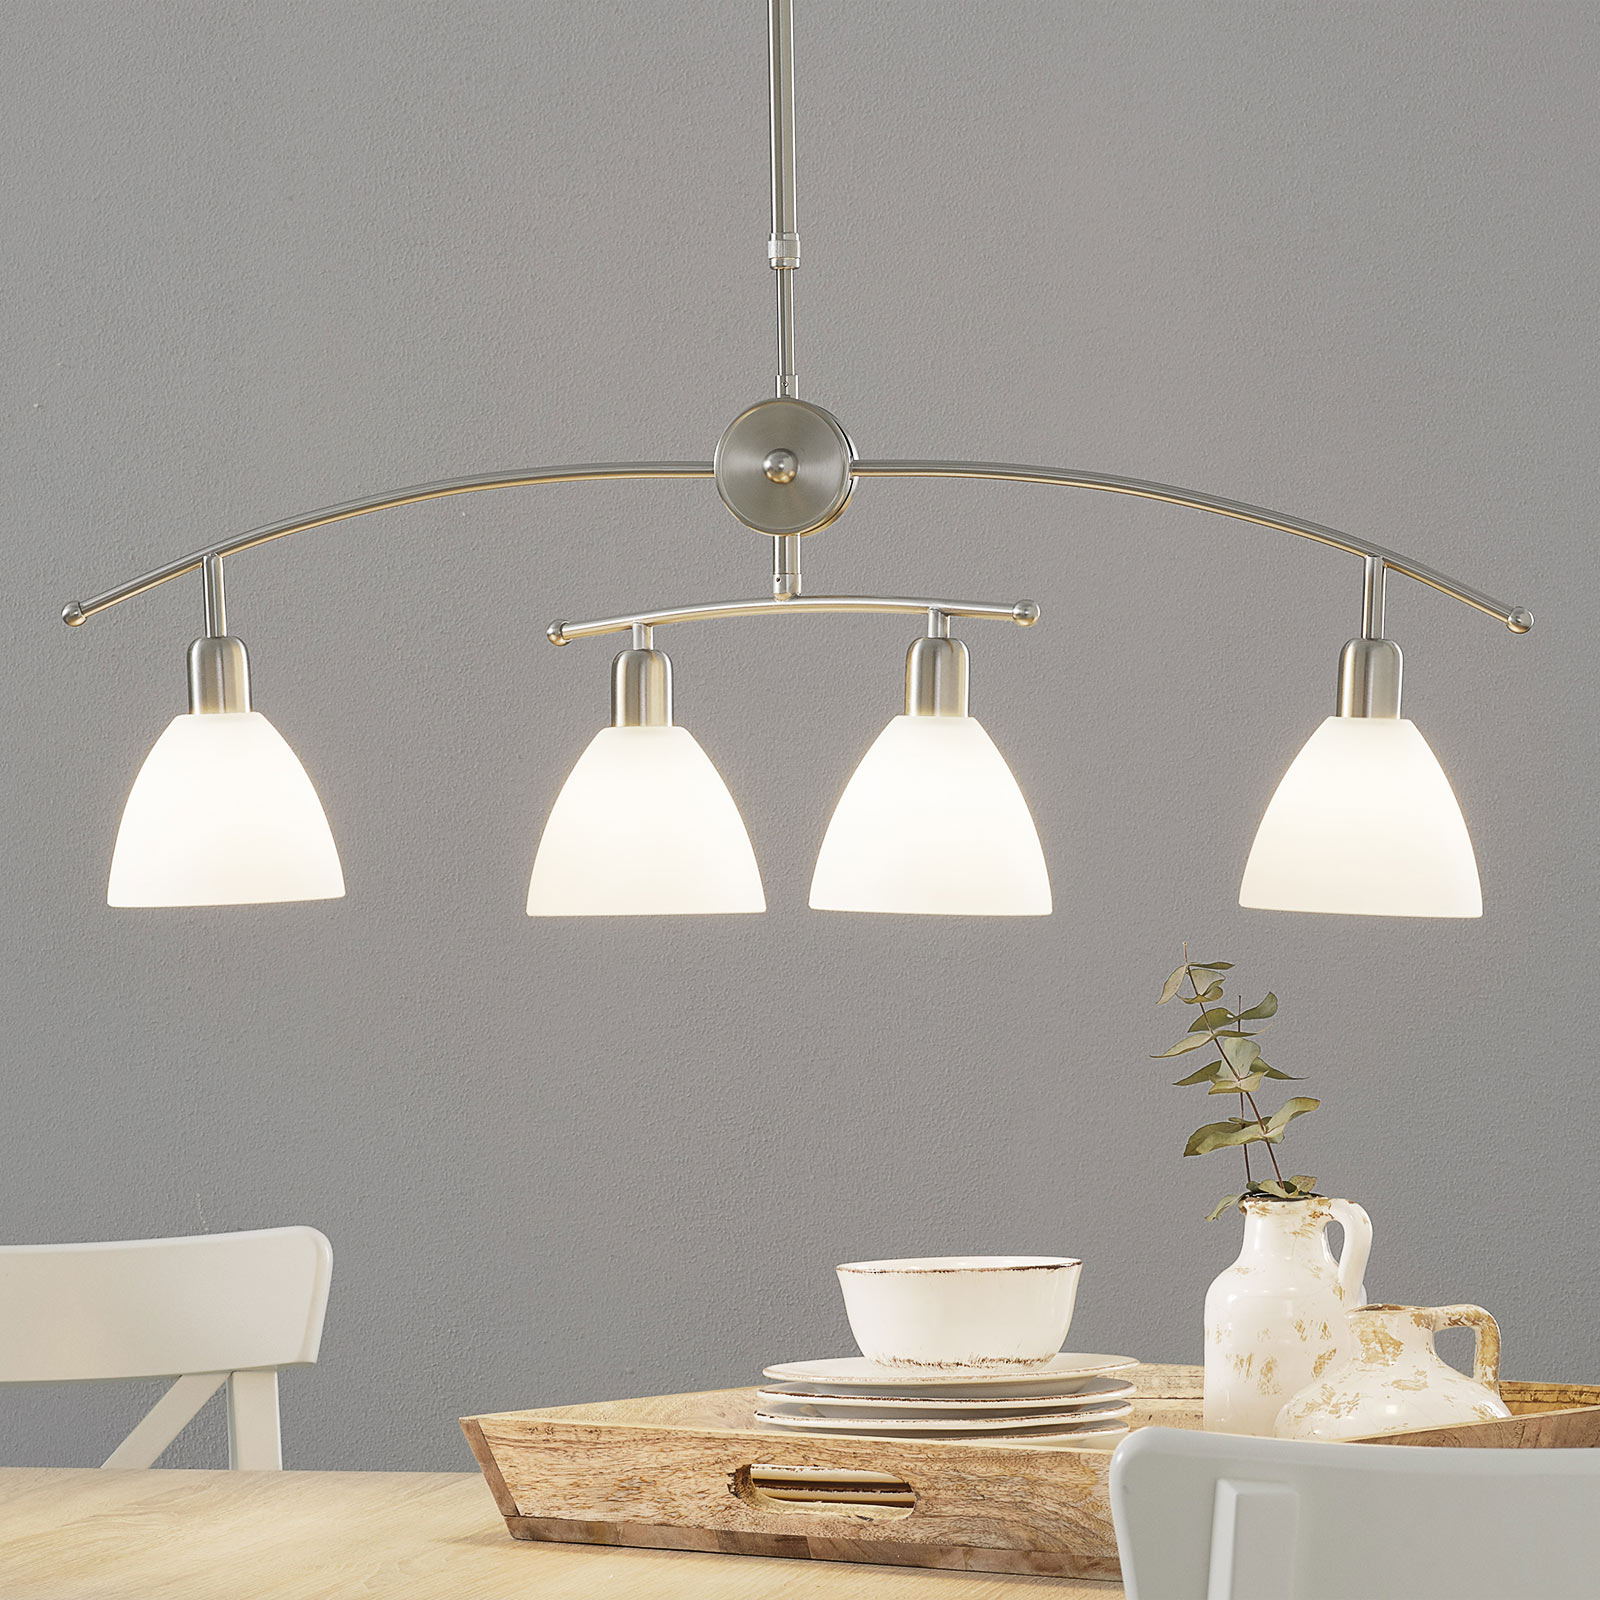 Charmante suspension KINGA à 4 lampes, nickel